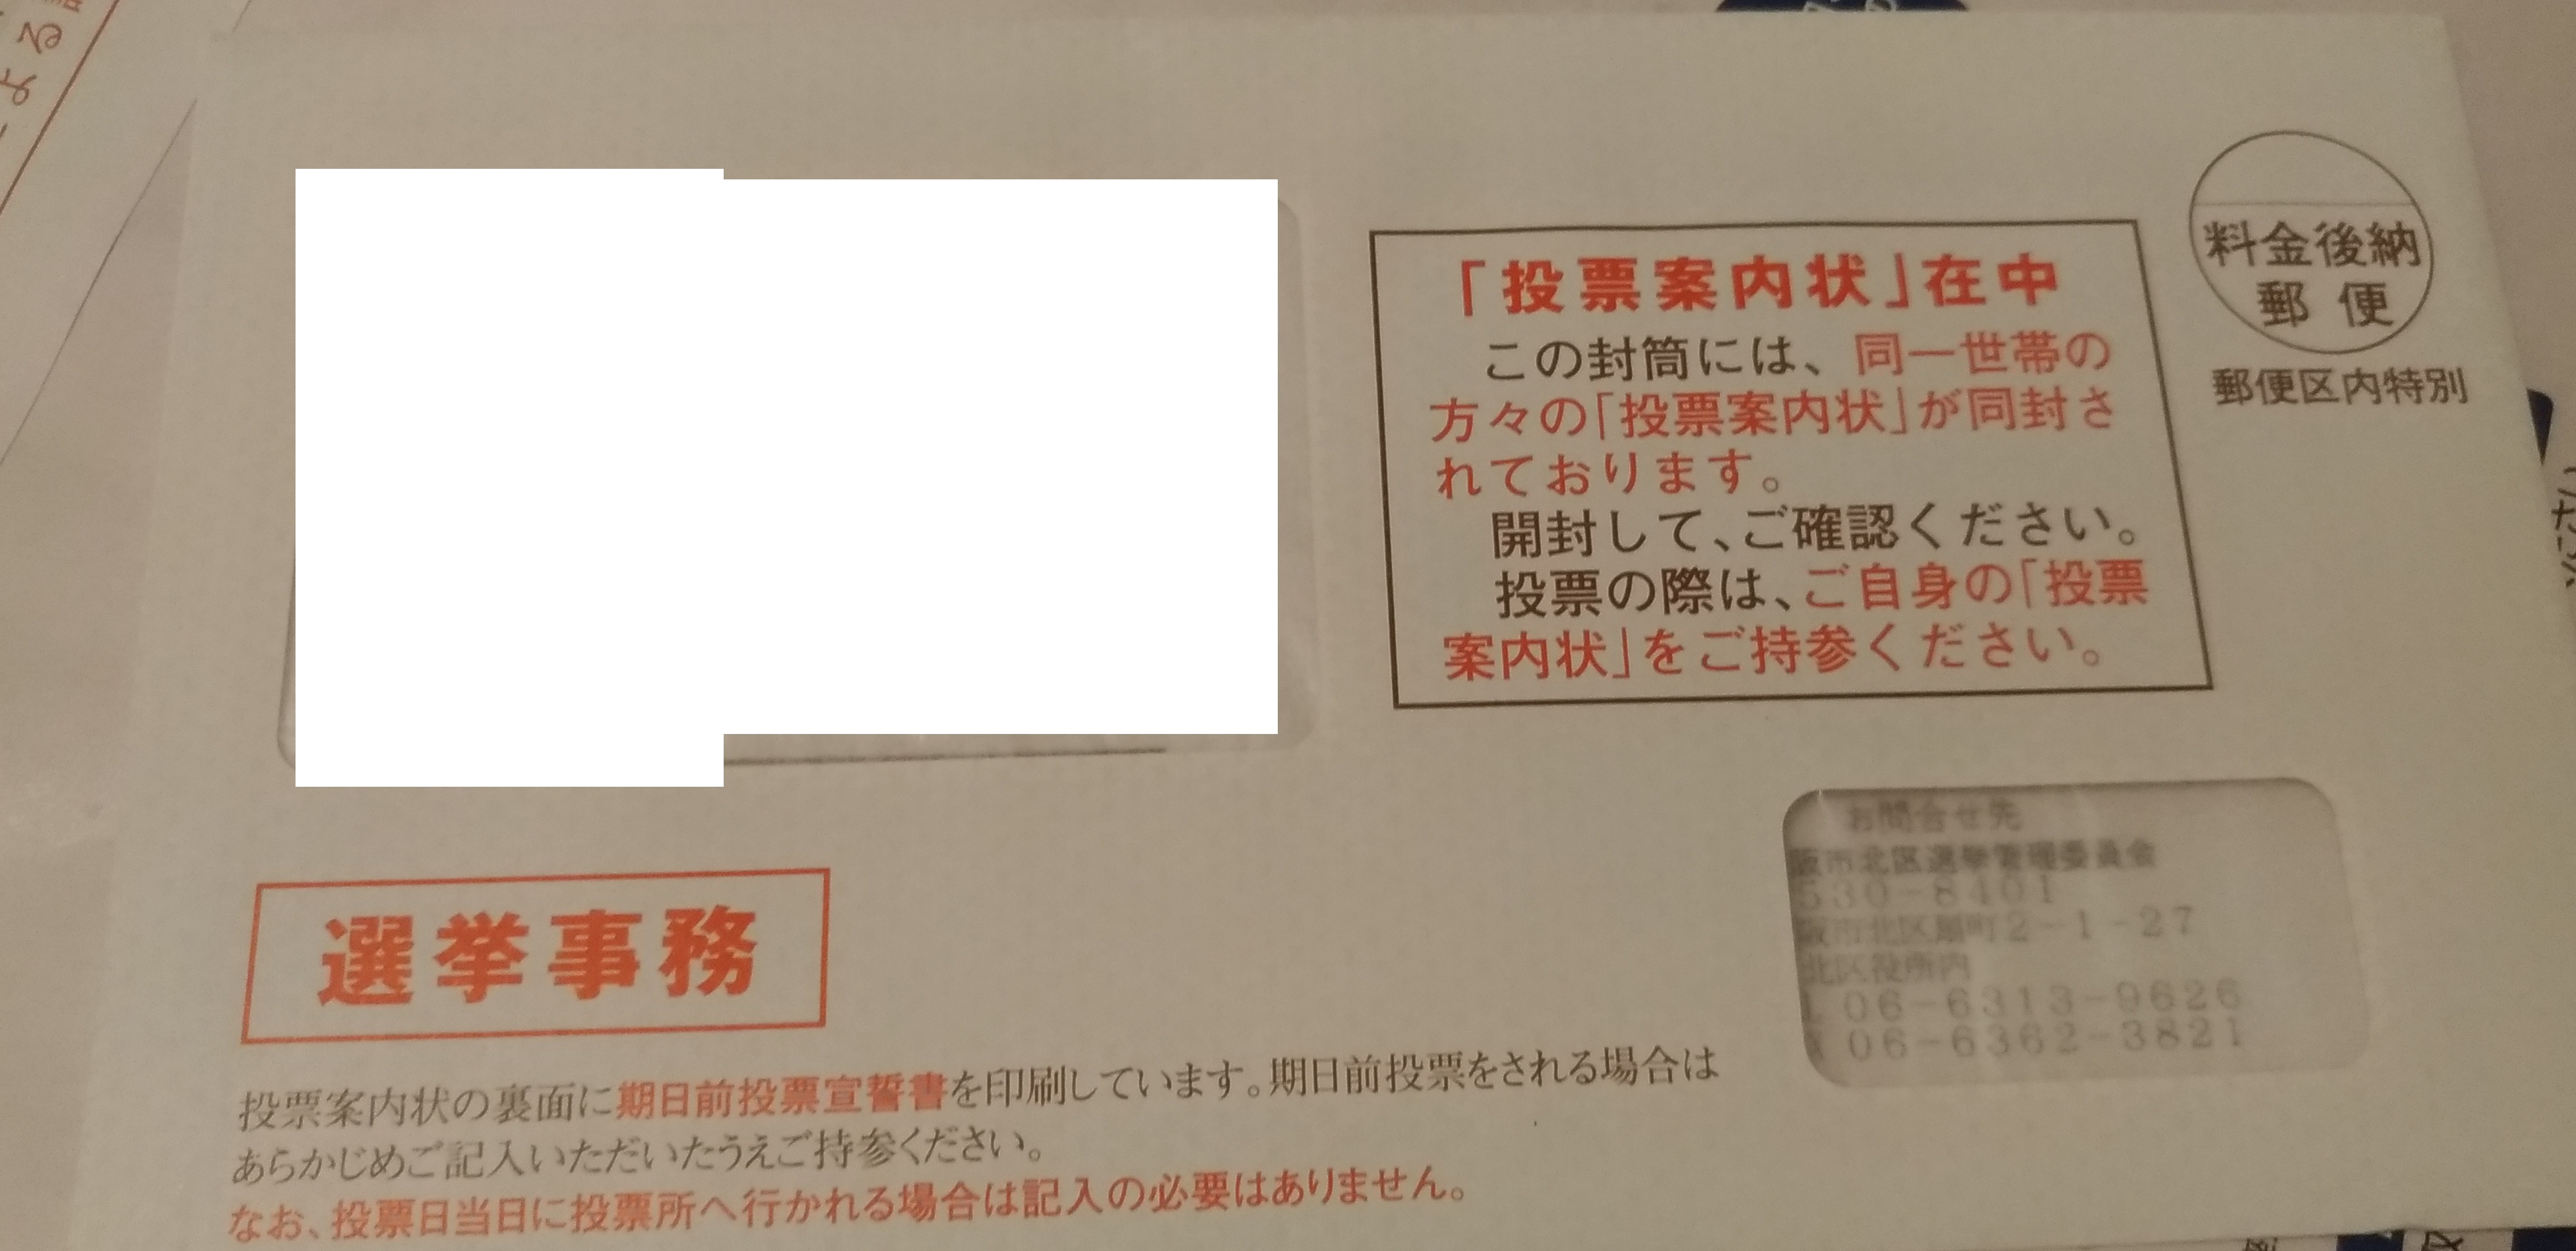 senkyo_osaka_201907.jpg